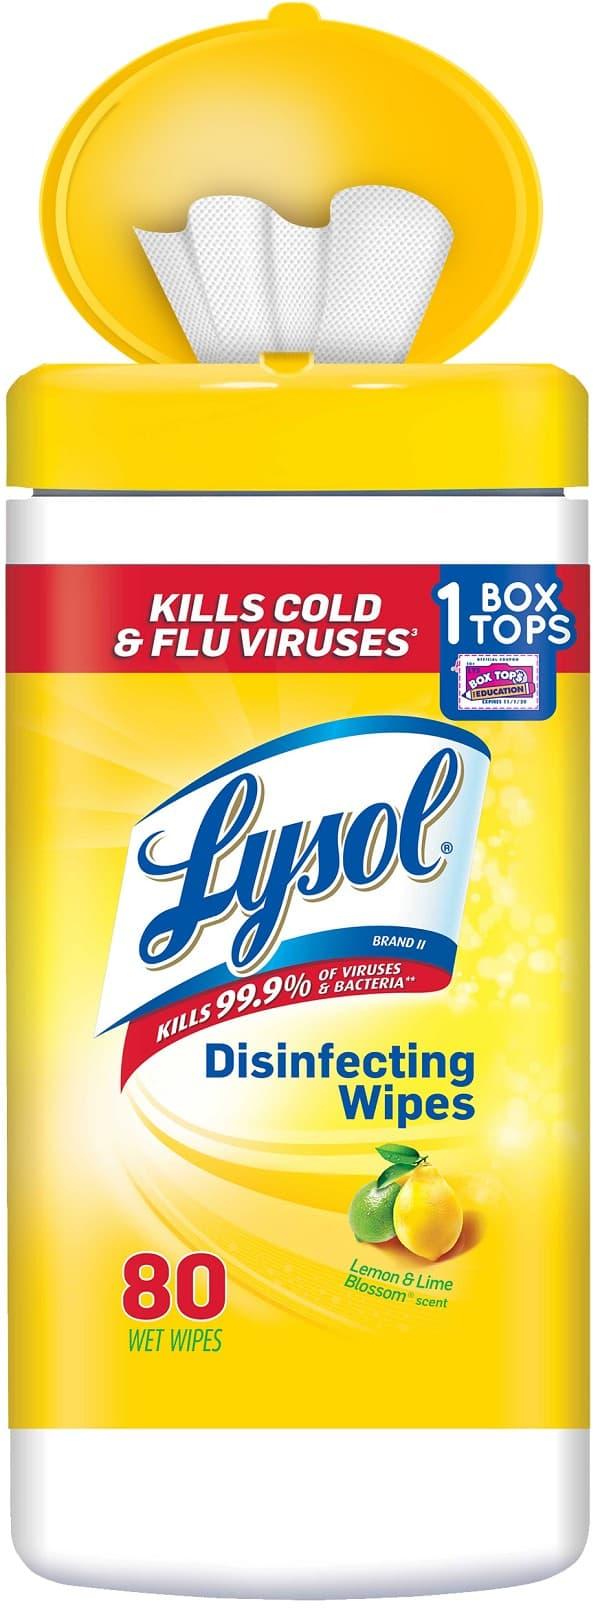 lysol_wipes